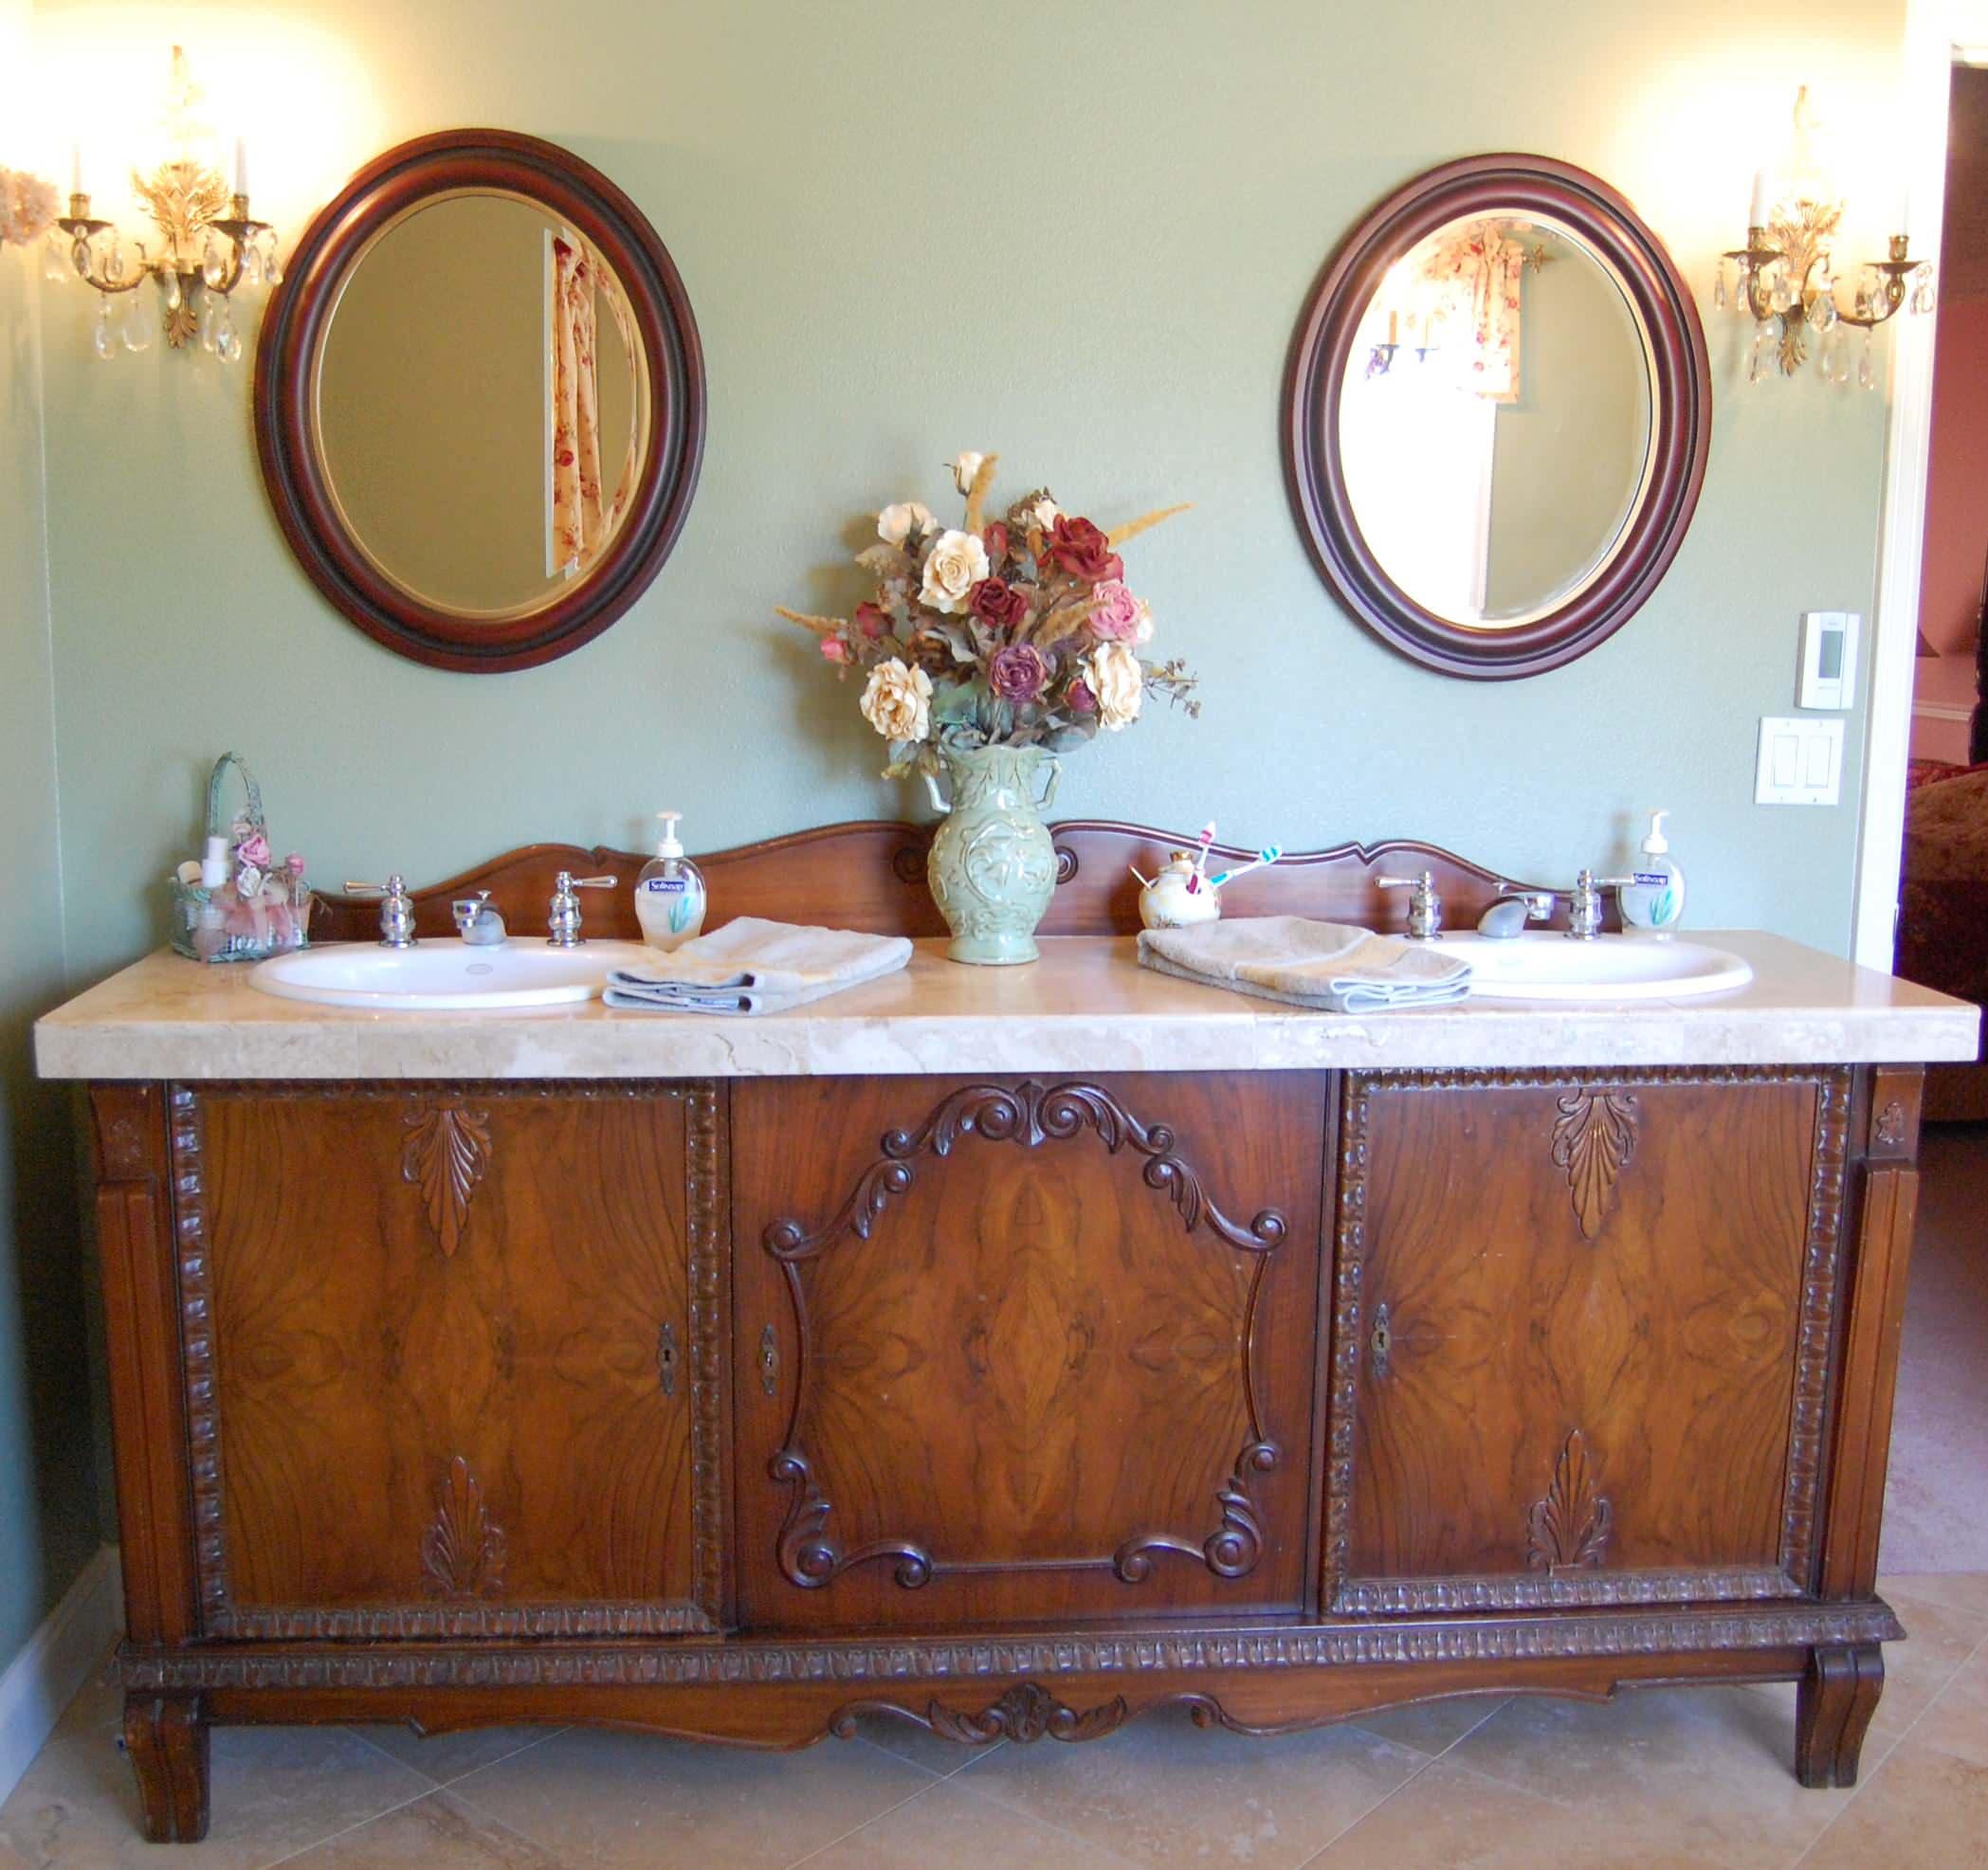 vanity-antique-traditional-style-bathroom